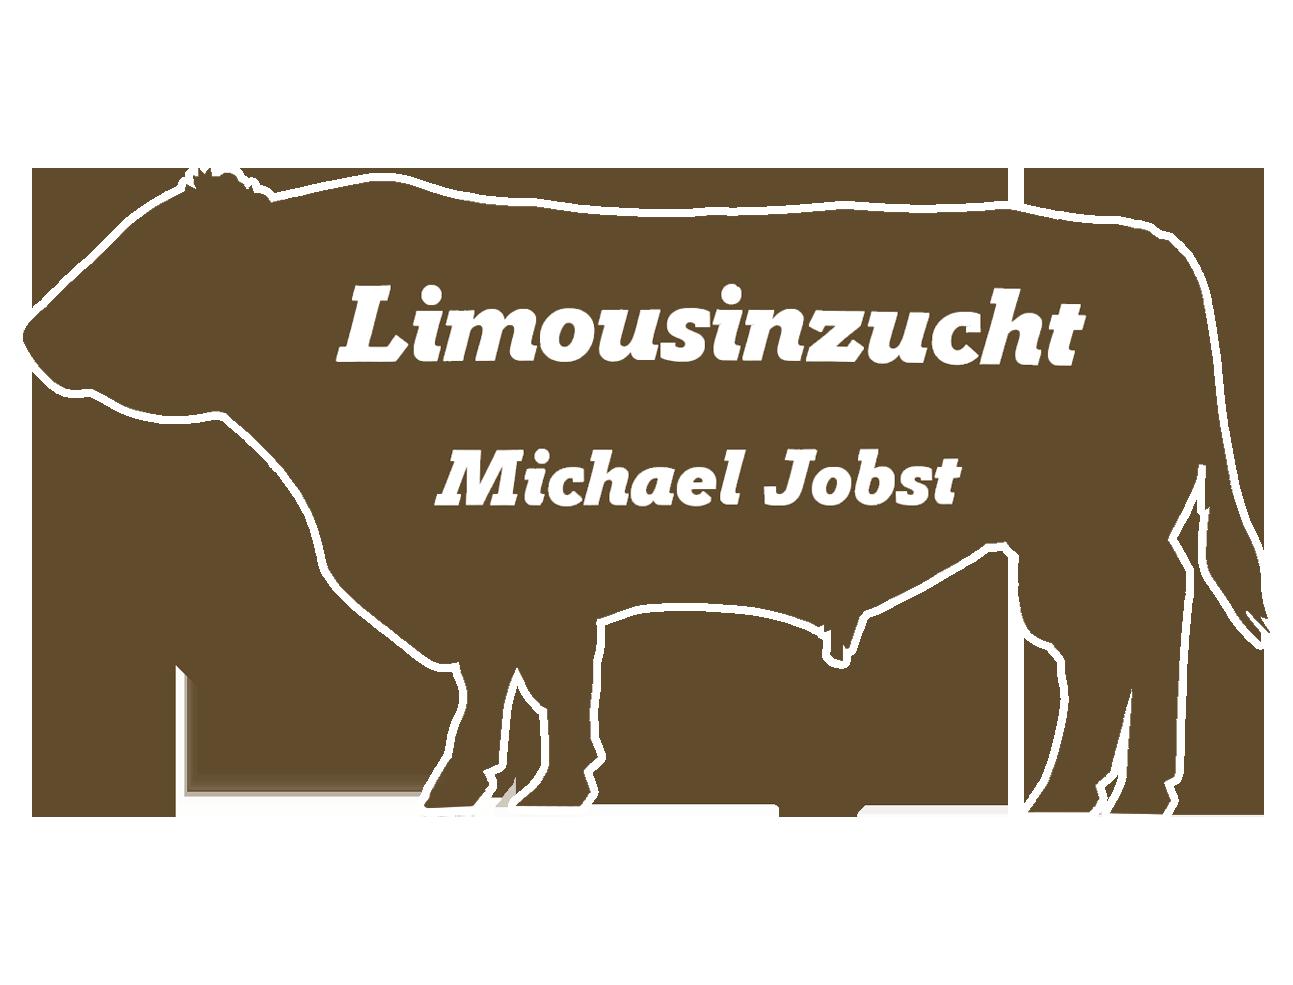 Limousinzucht Michael Jobst